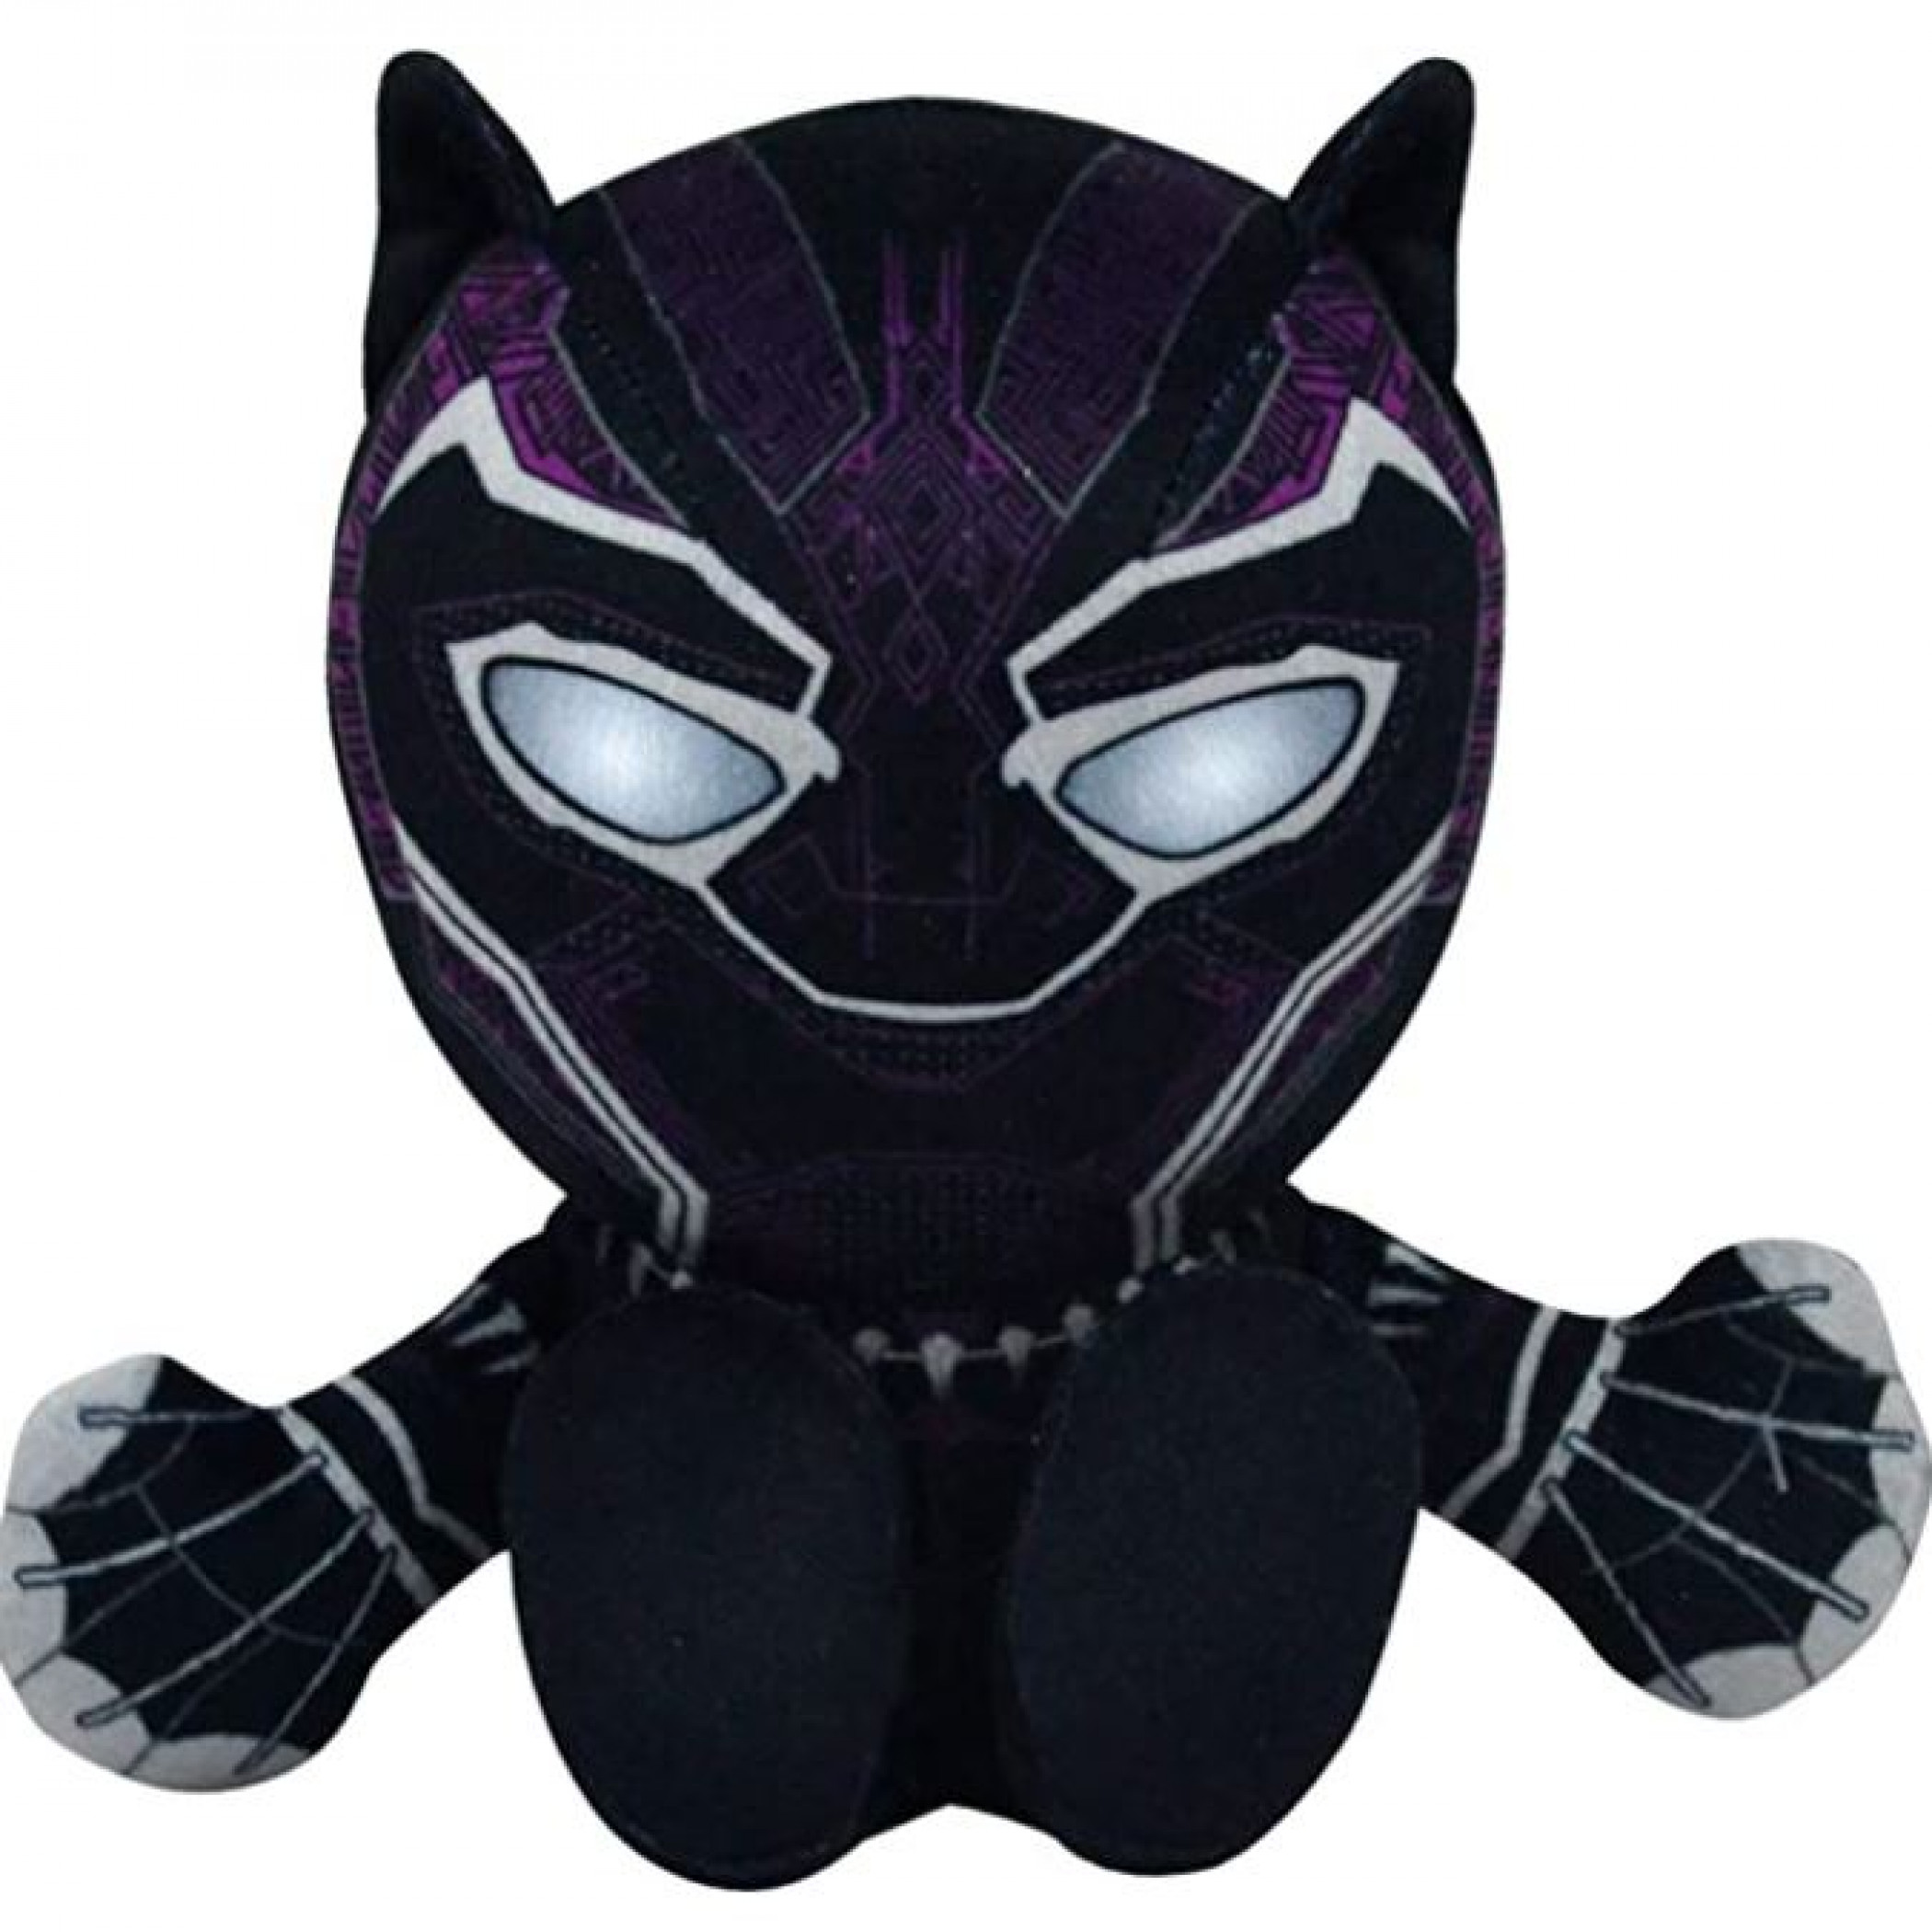 Marvel Black Panther 8 Inch Kuricha Sitting Plush Doll